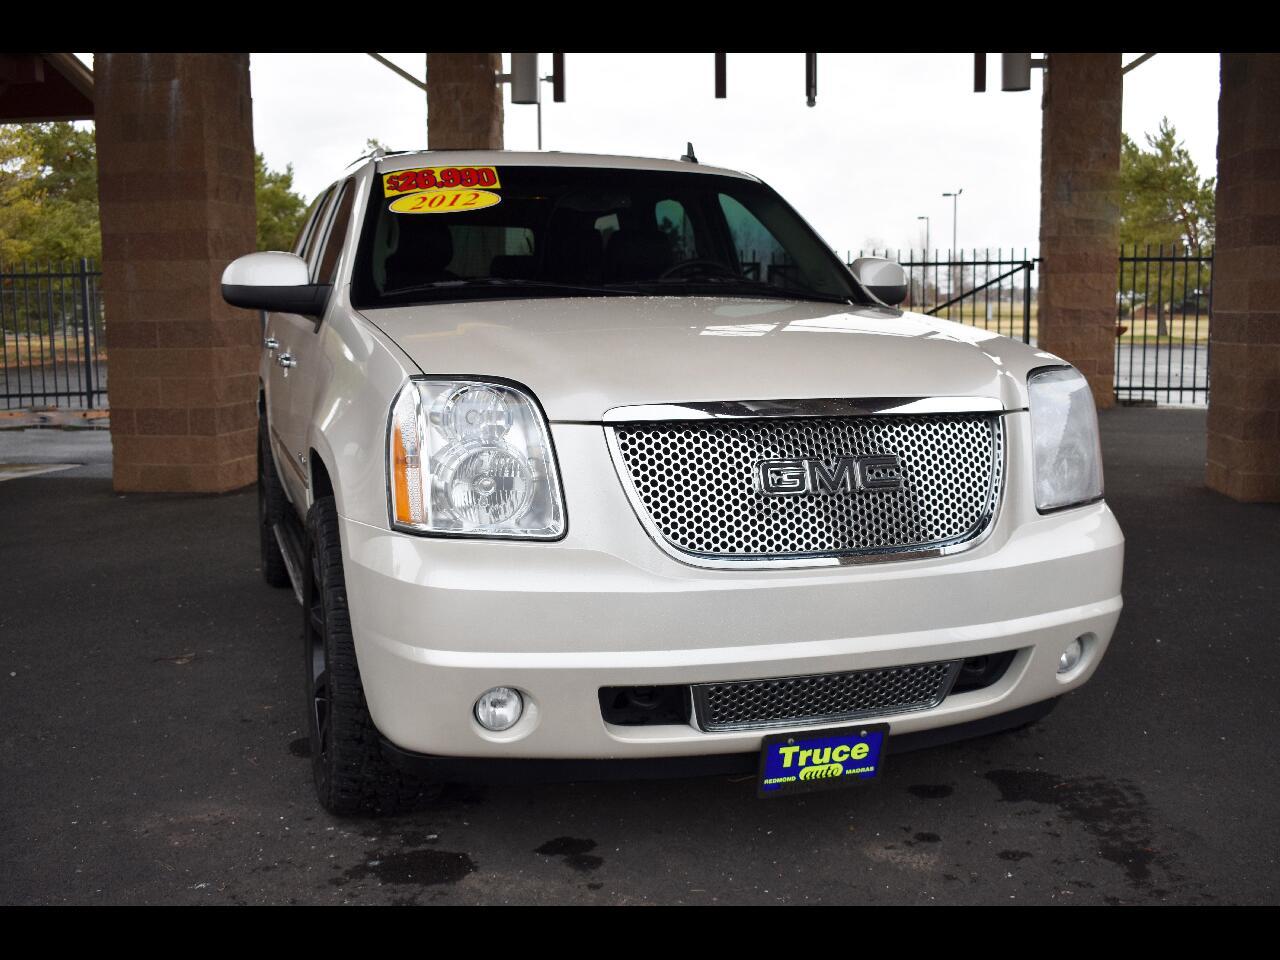 2012 GMC Yukon AWD 4 DR 1500 DENALI ***LOW MILES***